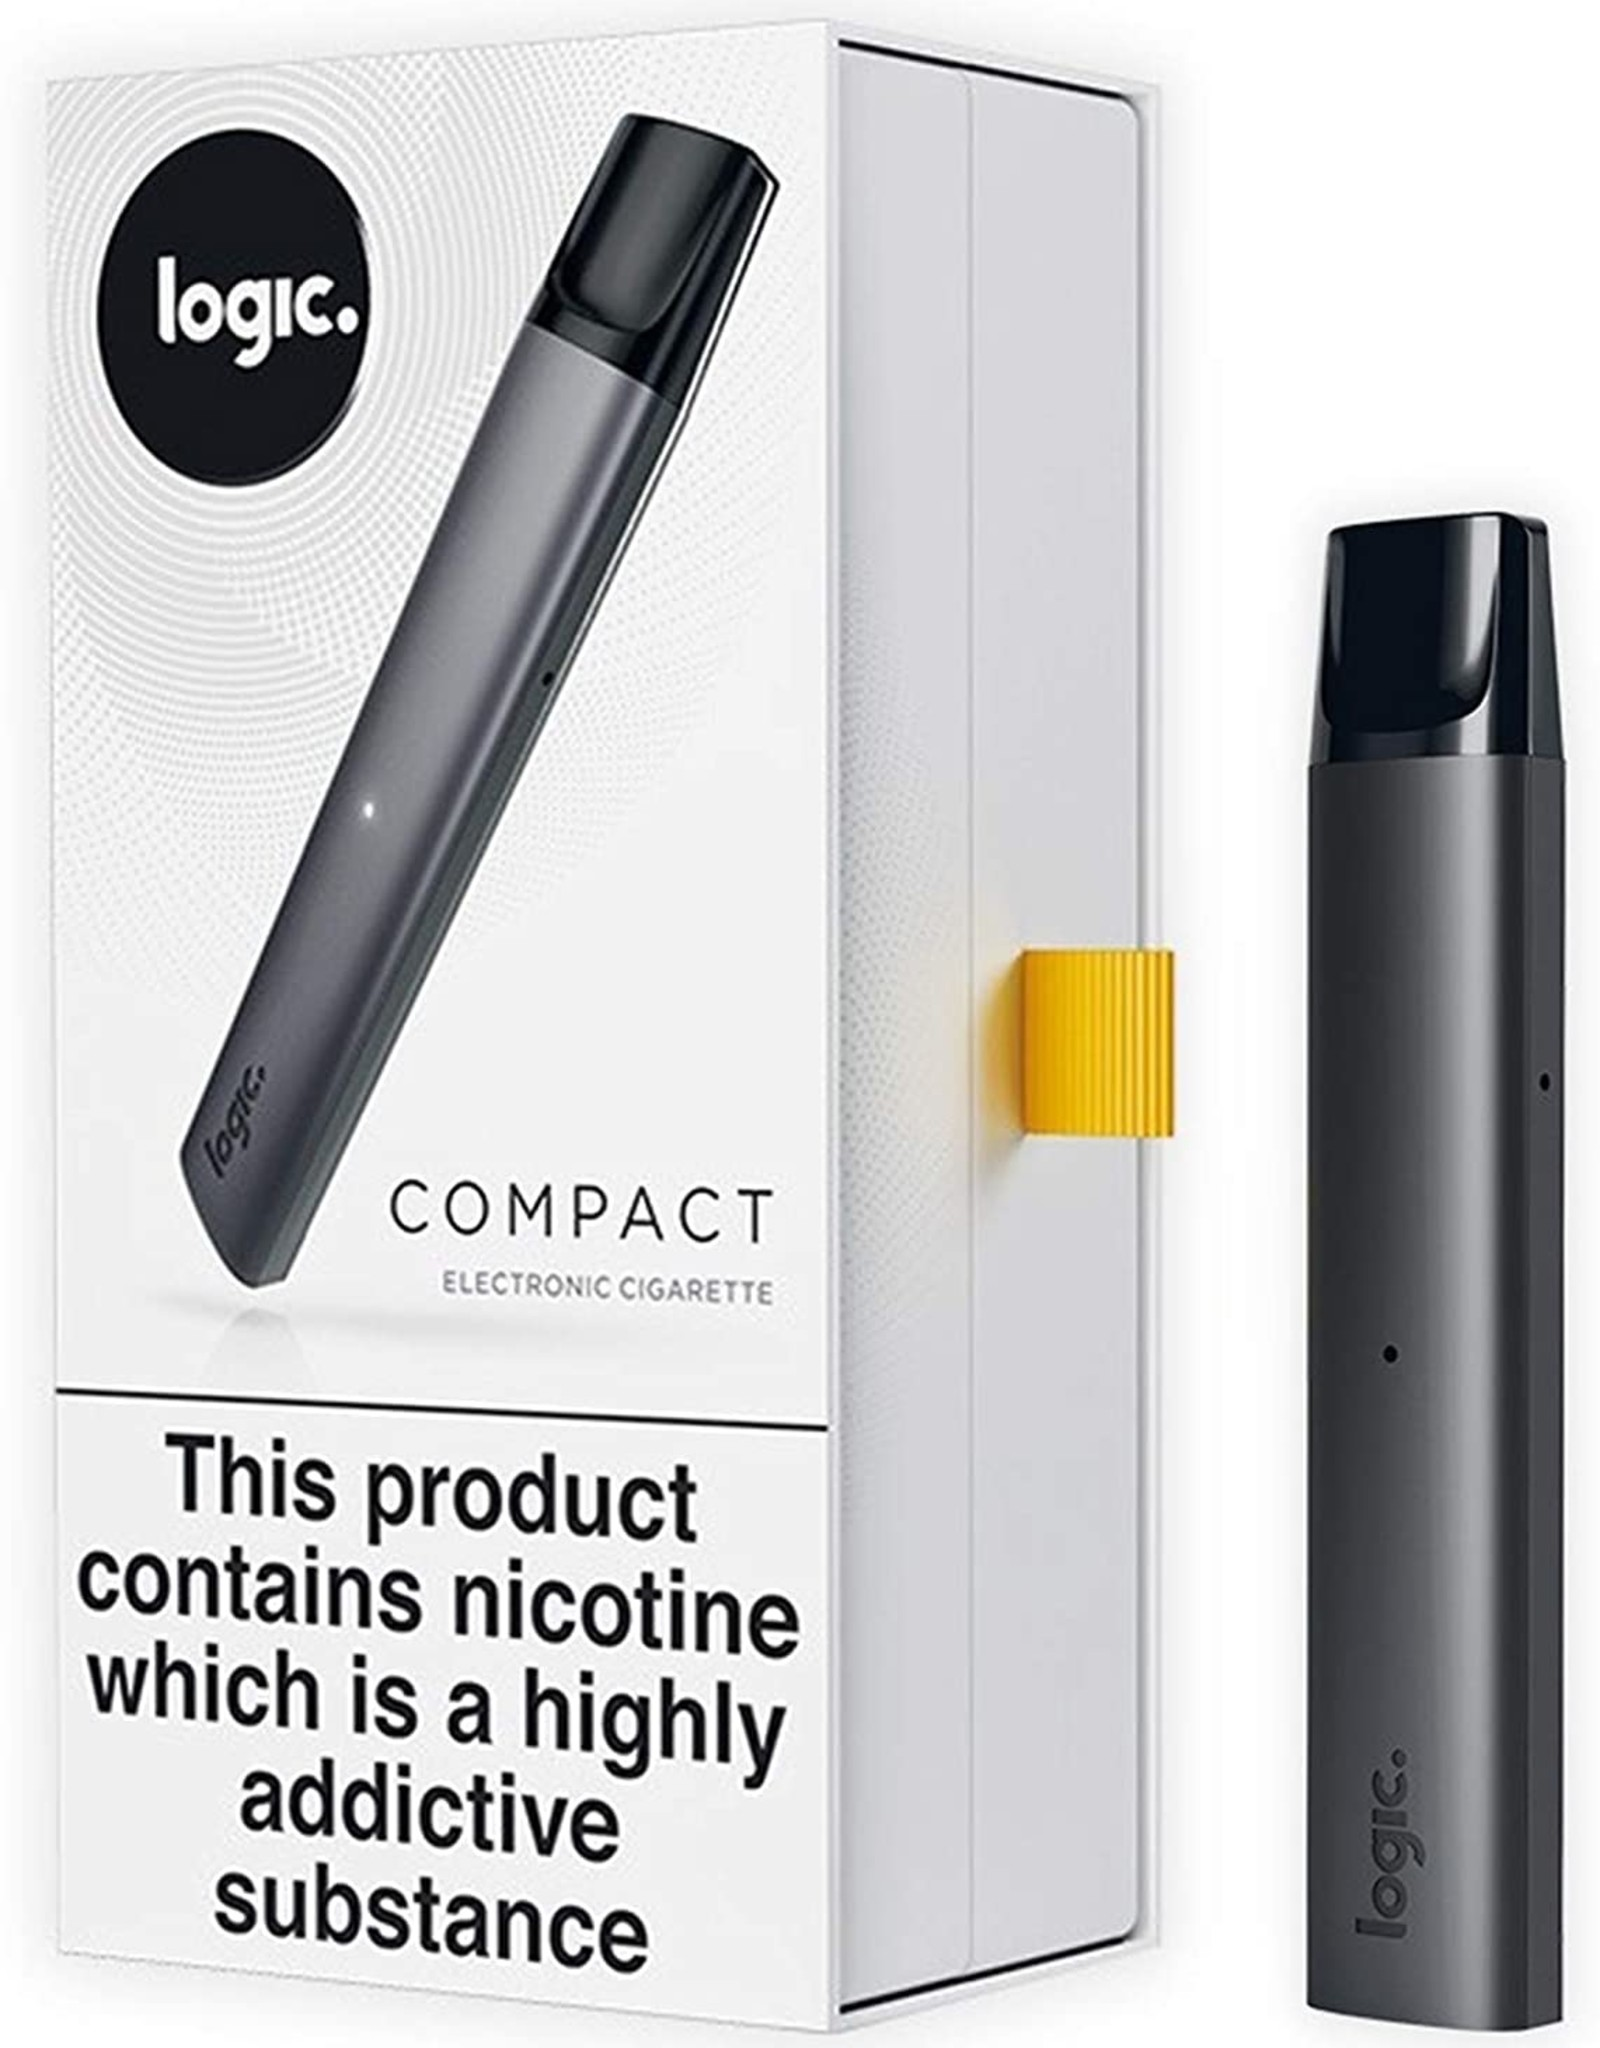 logic logic device